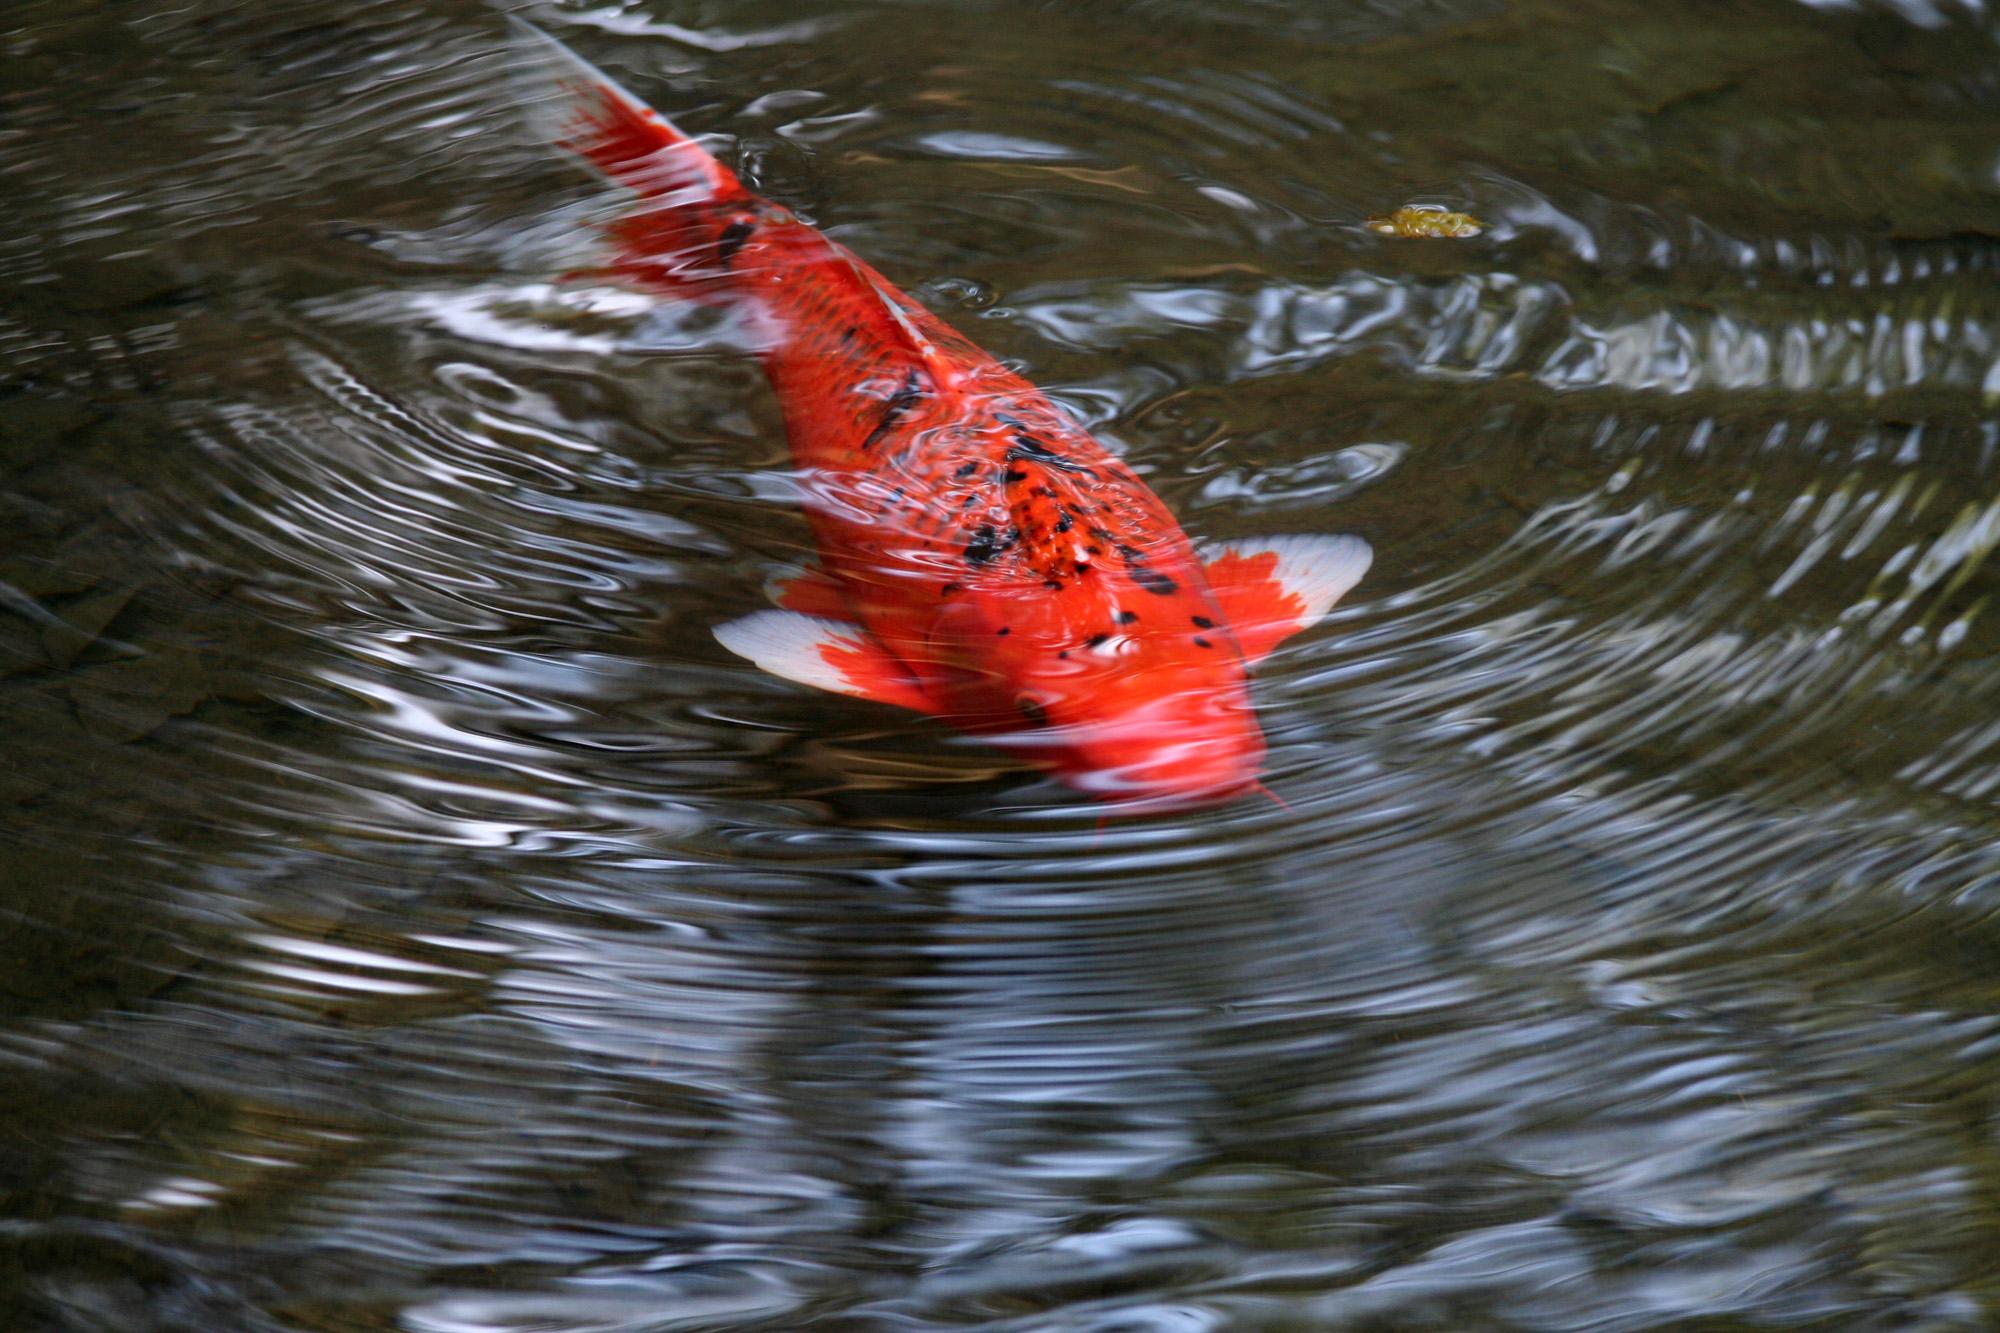 File:Bright orange fish.jpg - Wikimedia Commons